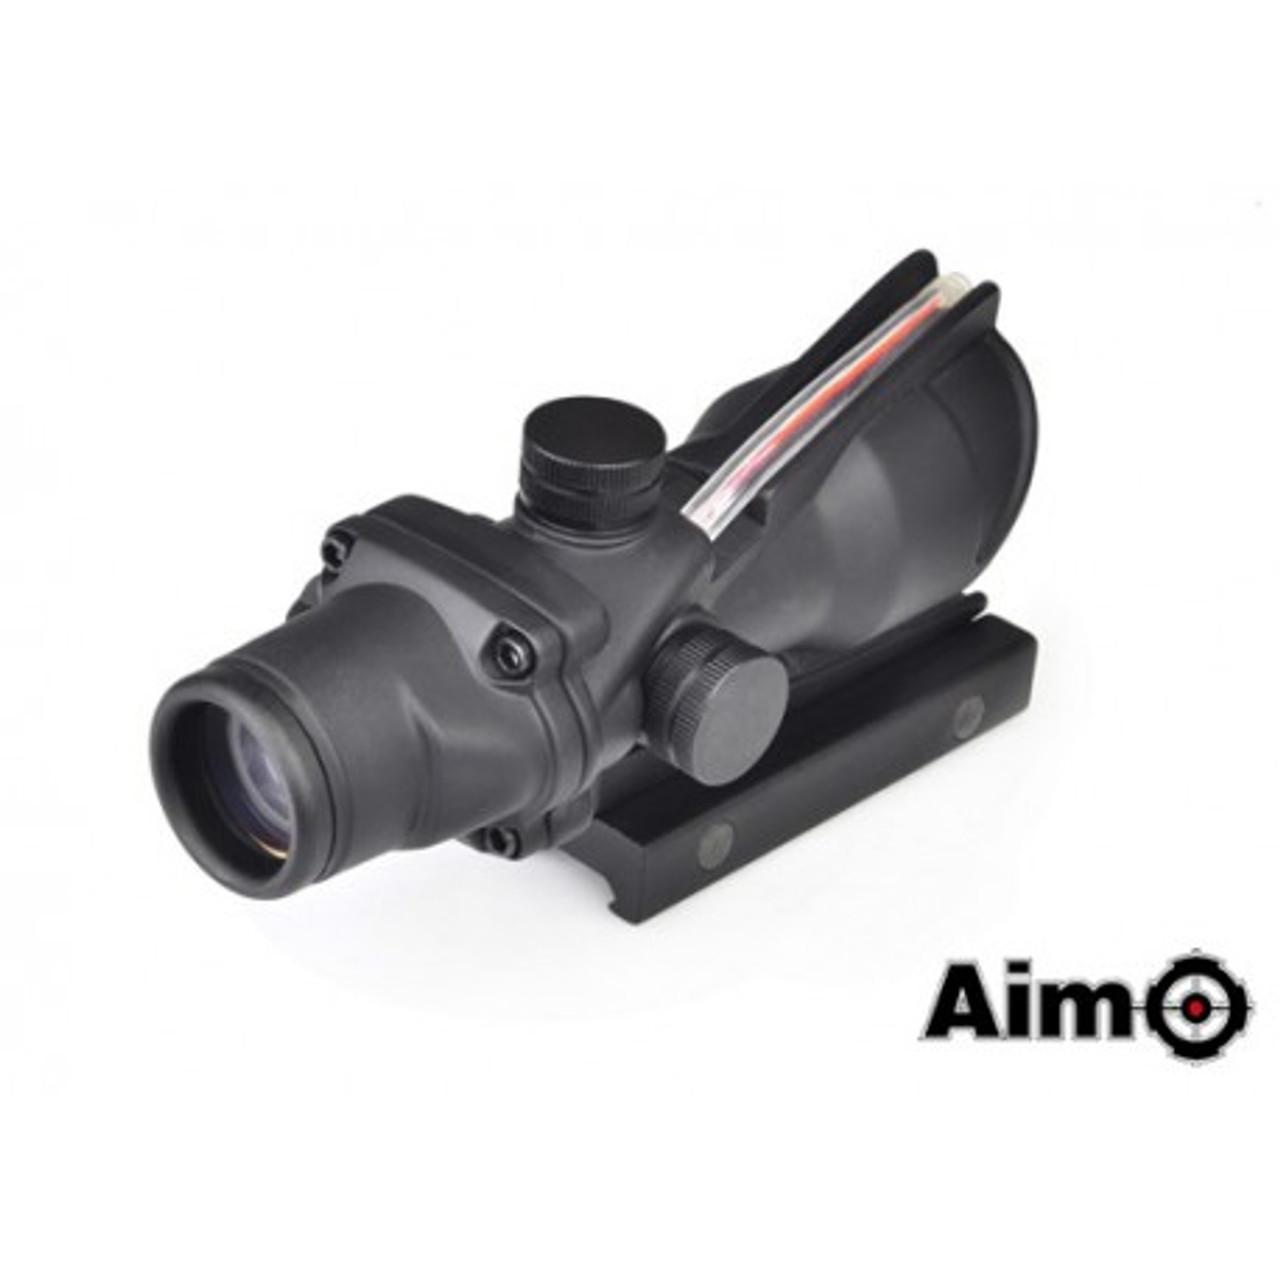 Aim-O ACOG 4X32 Red Dot Real Fiber Optic